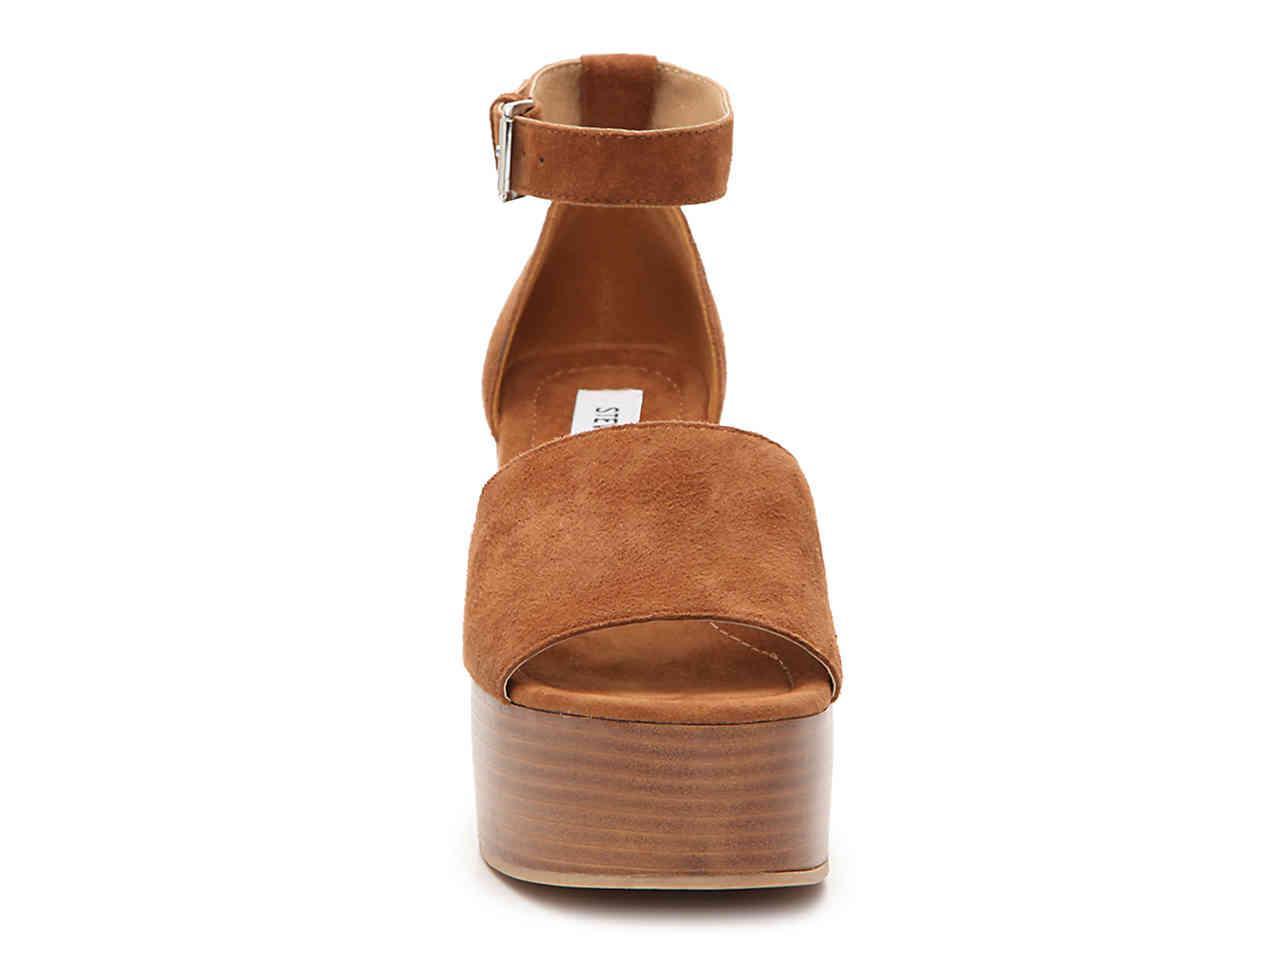 4a0cfdfb400 Lyst - Steve Madden Zala Wedge Sandal in Brown